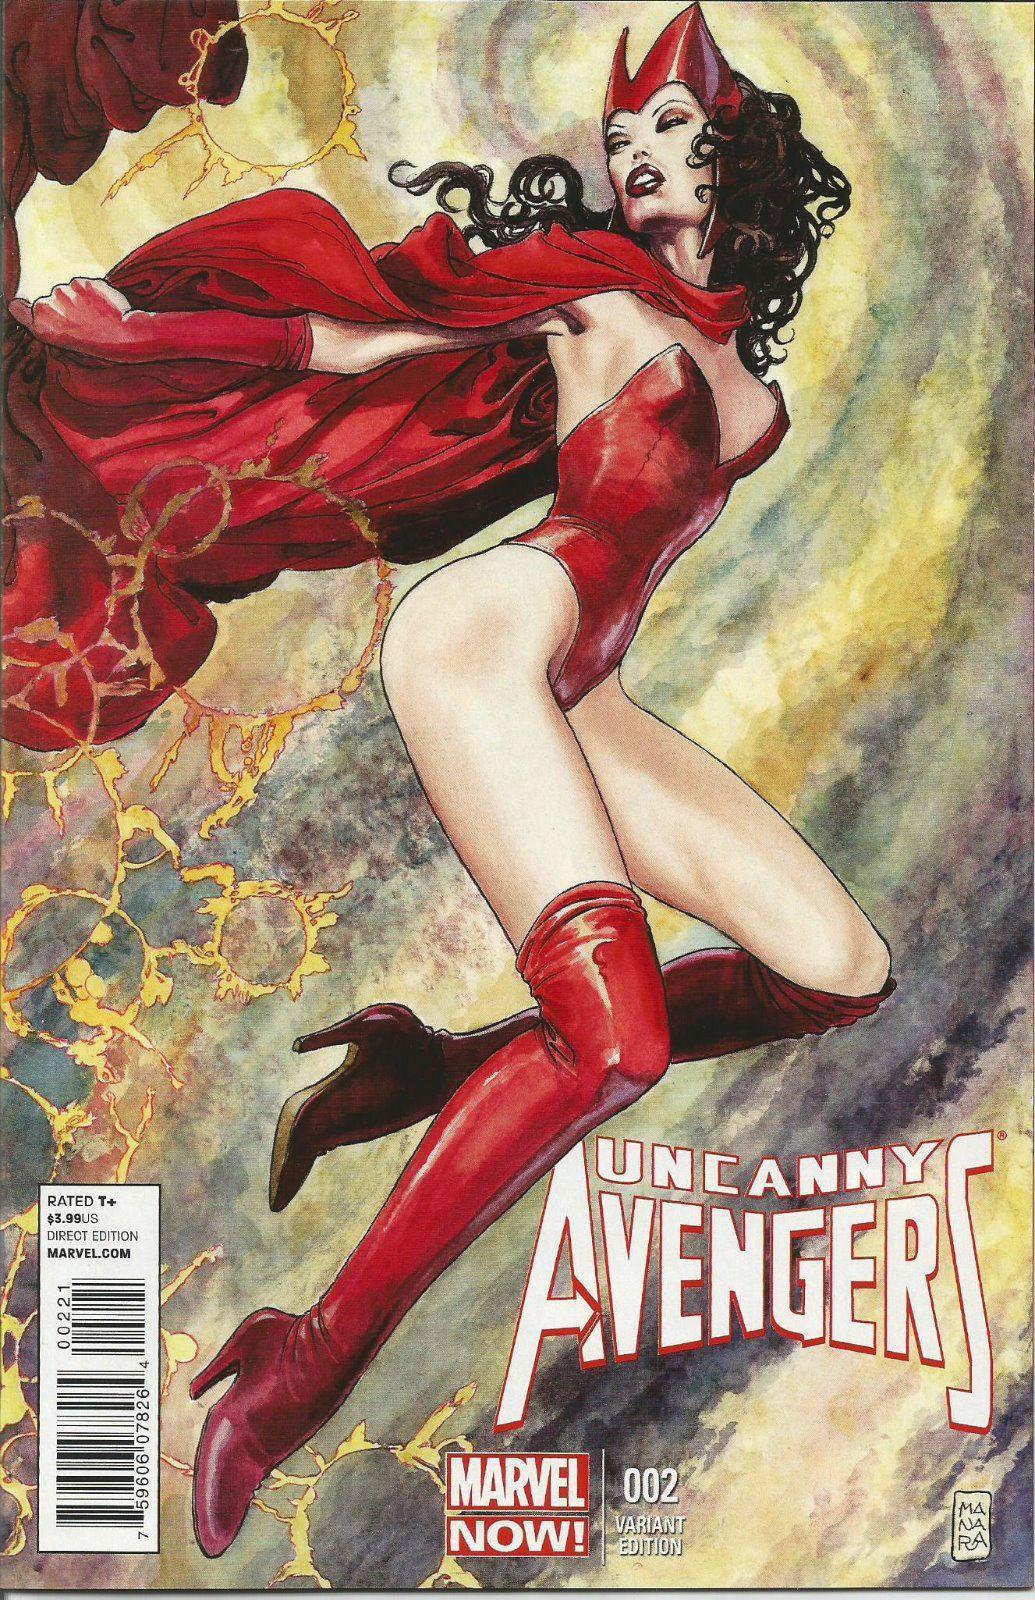 comix=_avengersmilo-manara-marvel-comic-covers_1951.JPG